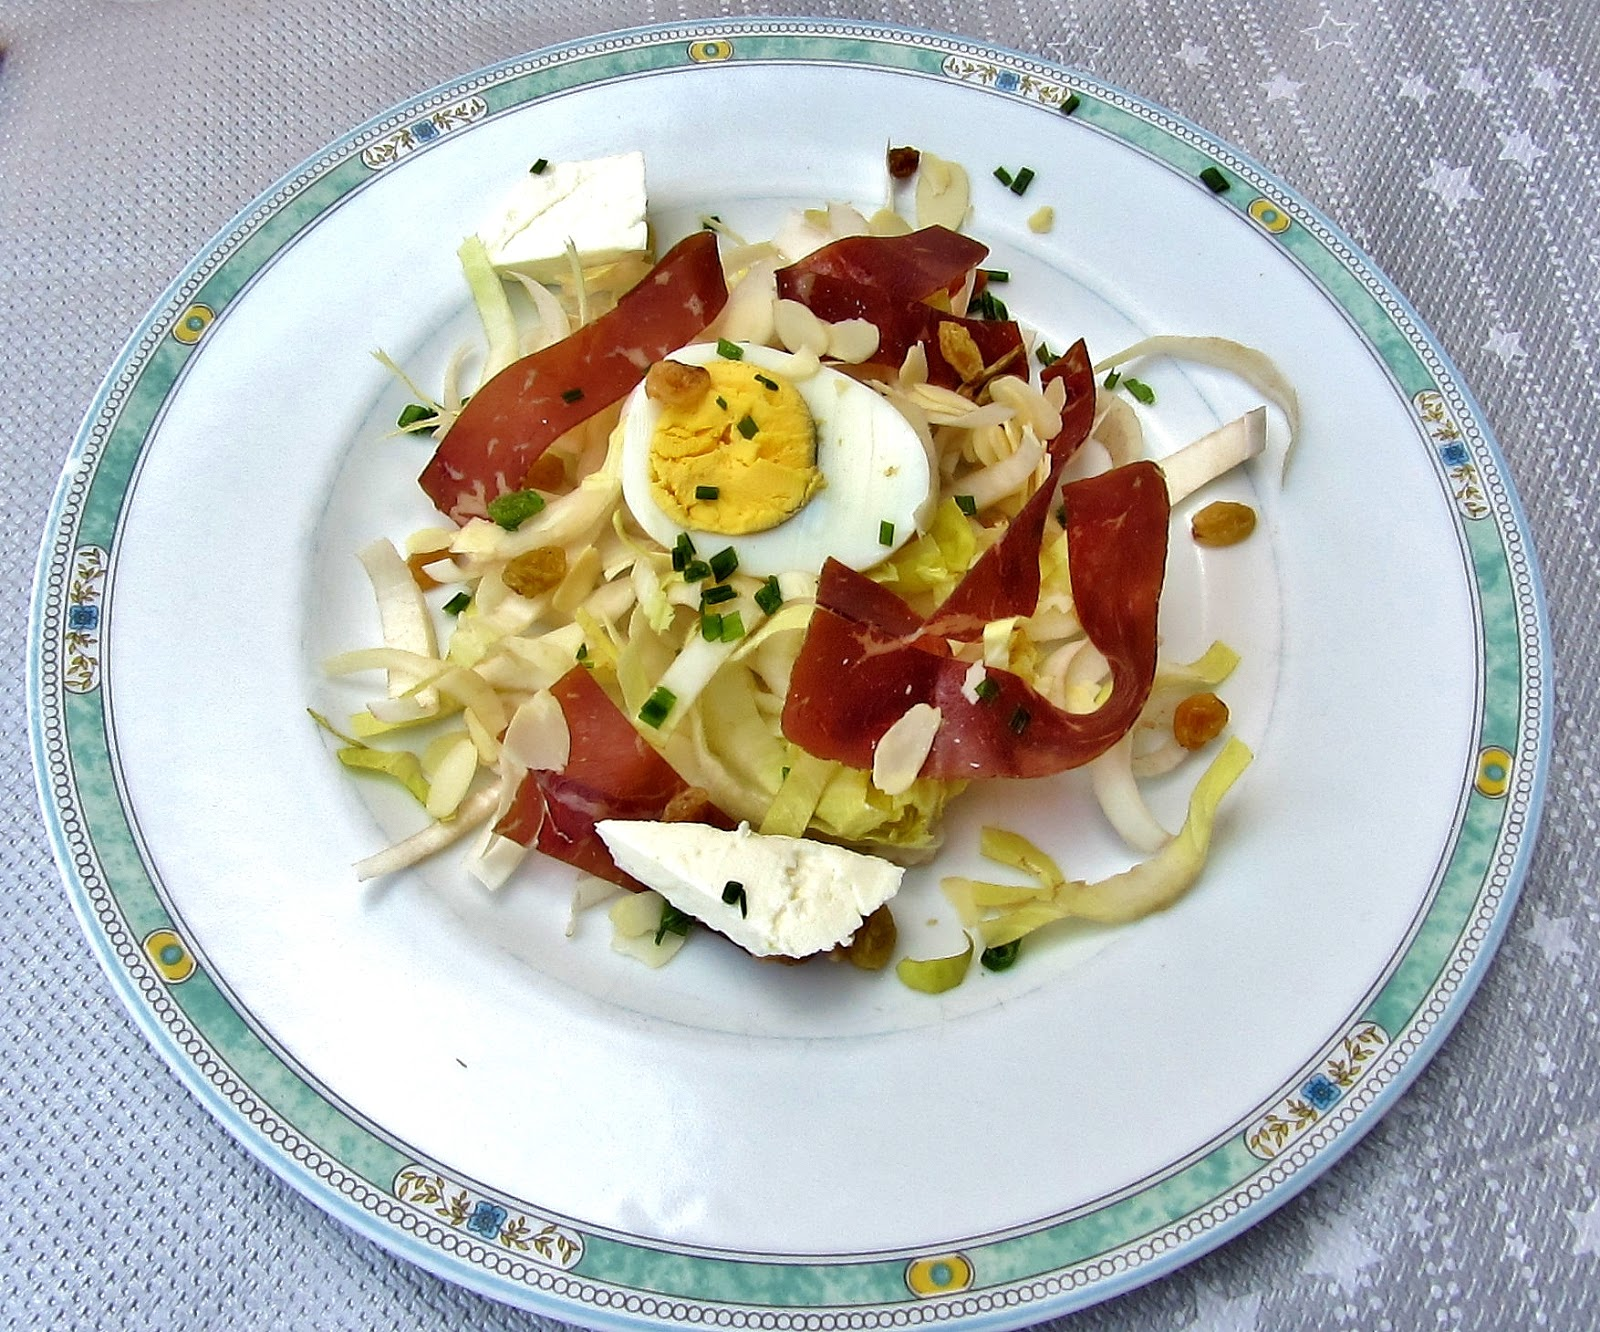 Entree Sympa Facile Of Les Recettes De Babeth Salade D Endives La Viande Des